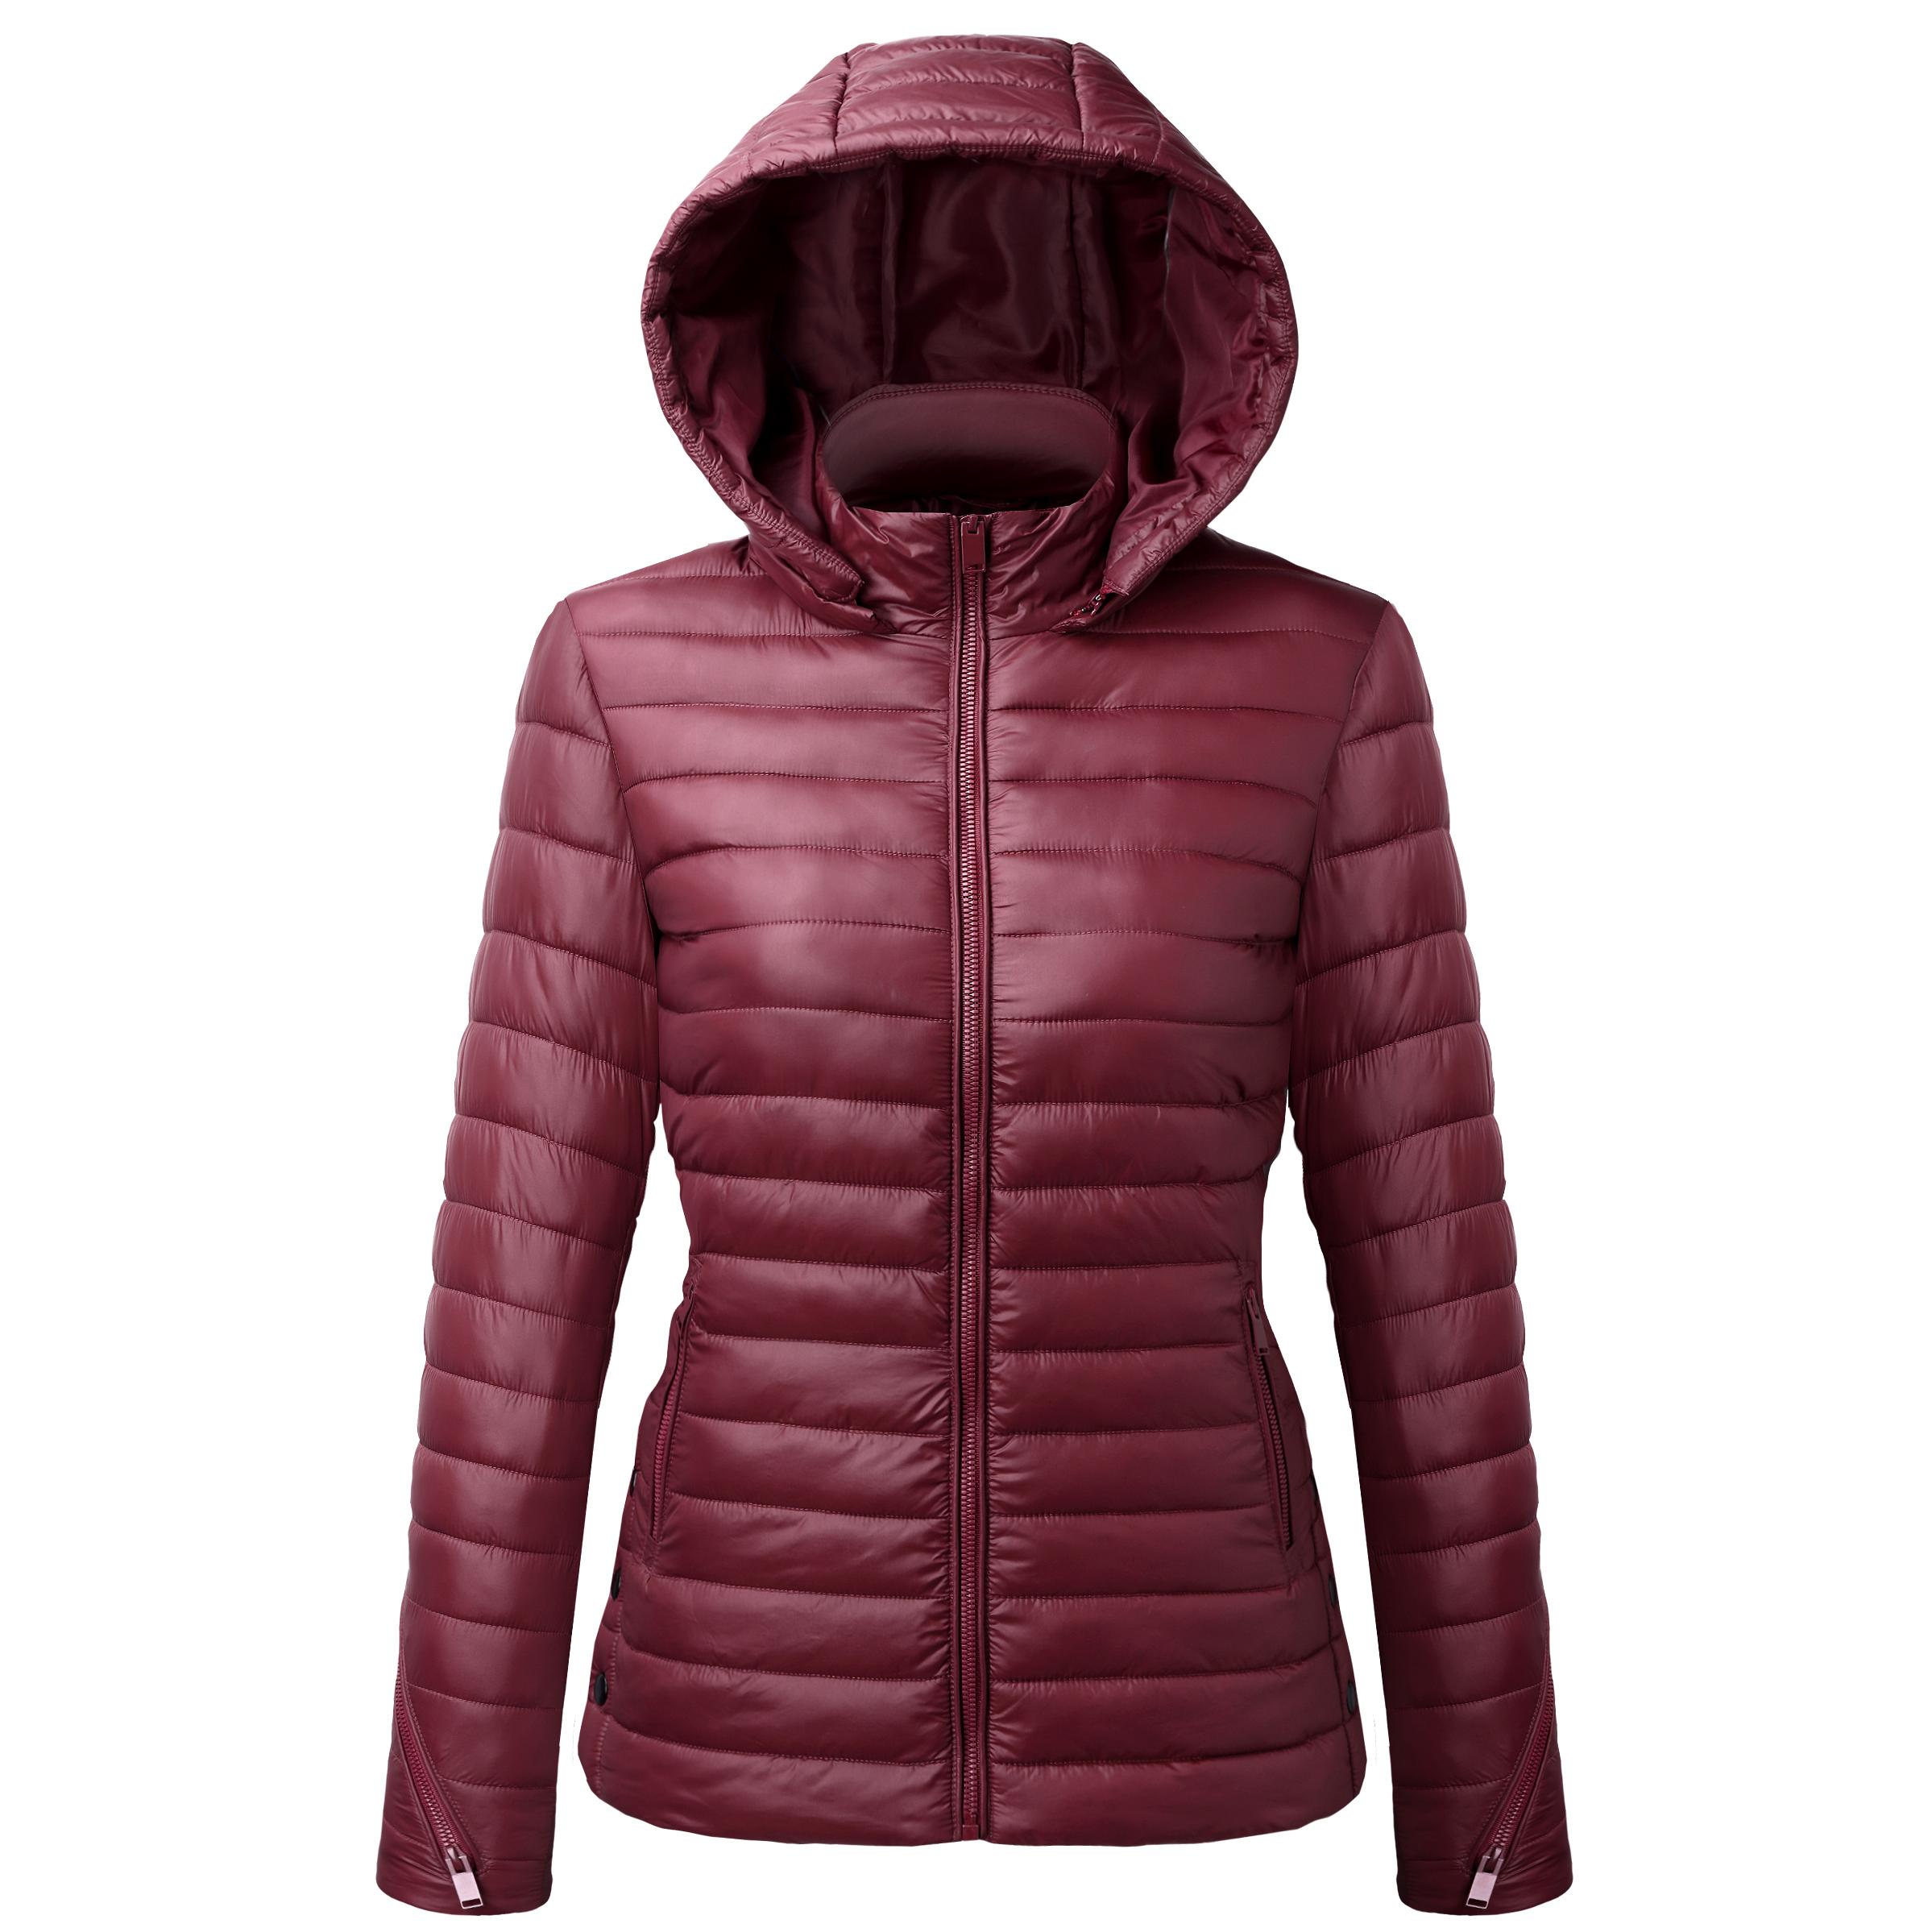 2018 Factory Direct Sale Wholesale 100% Nylon Red Winter Jacket Coat Women  - Buy Winter Jakets Women Coats d2ef75679